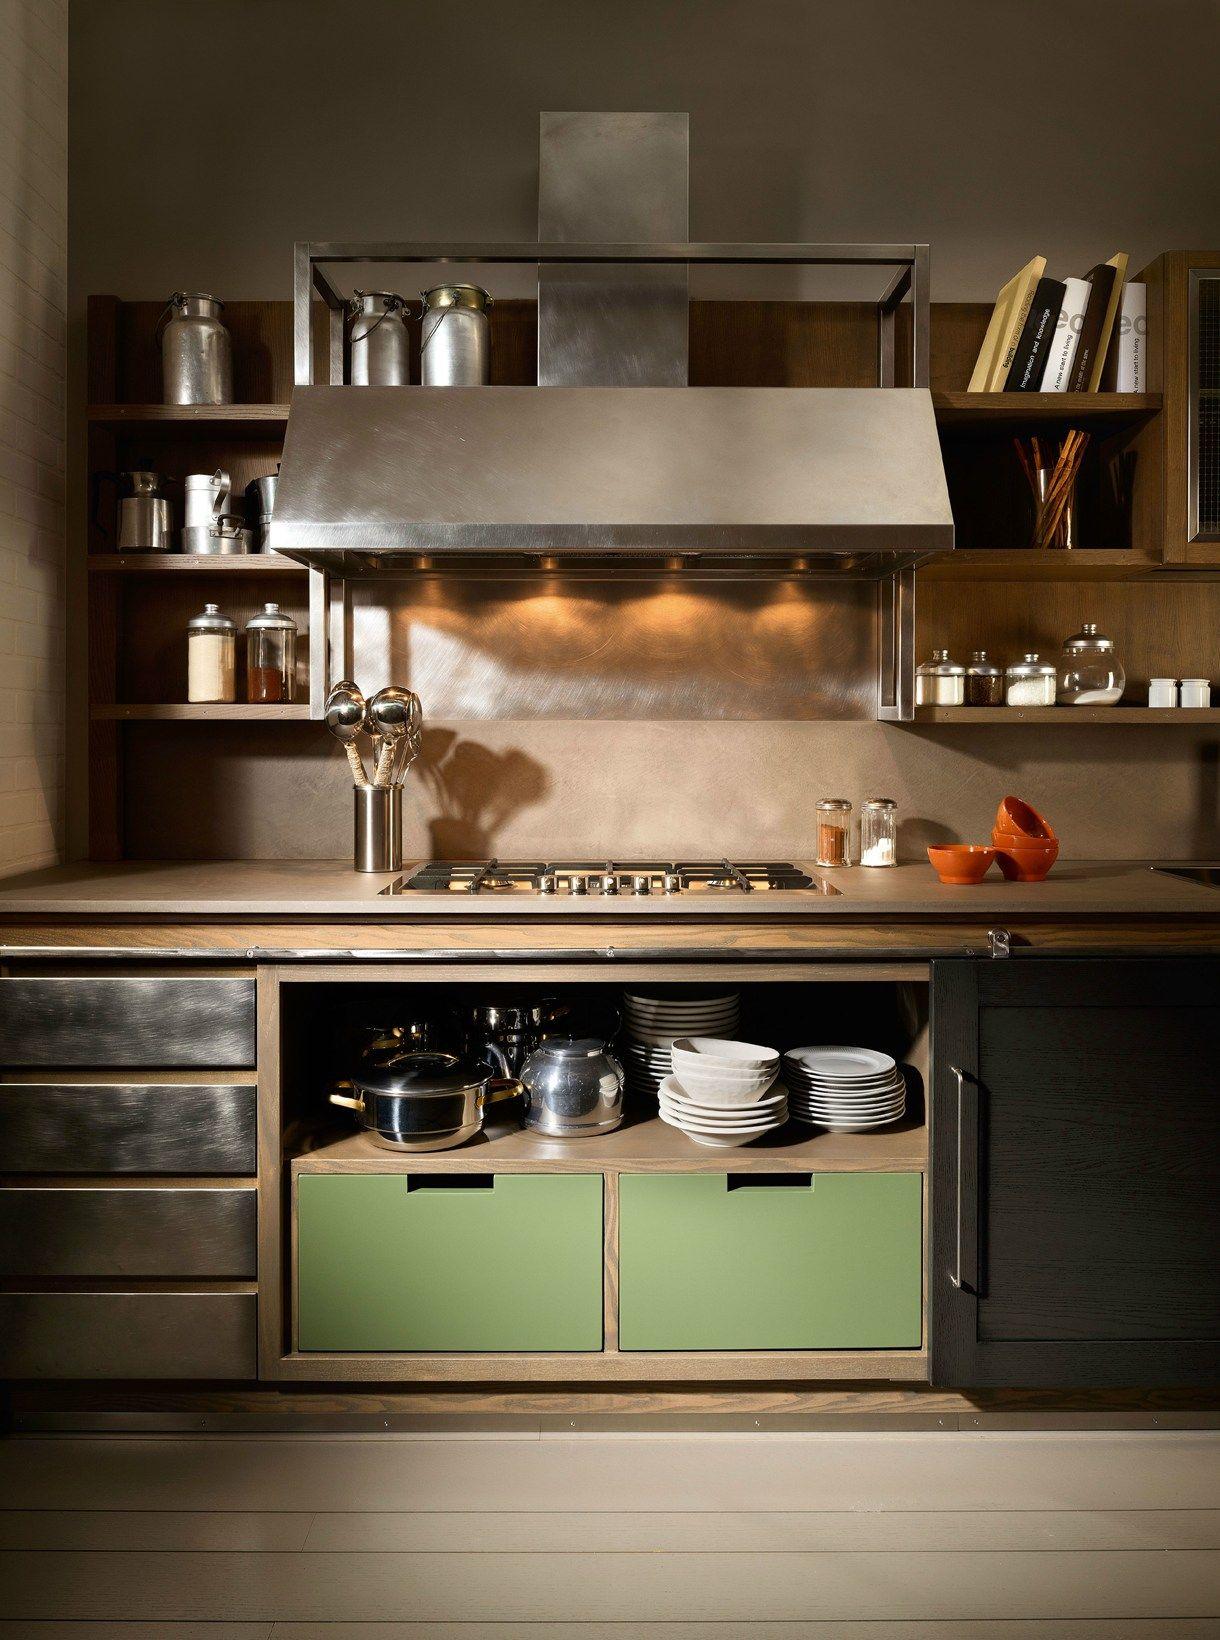 Cucina stile industrial chic idee per la casa nel 2019 pinterest - Cucine industrial chic ...